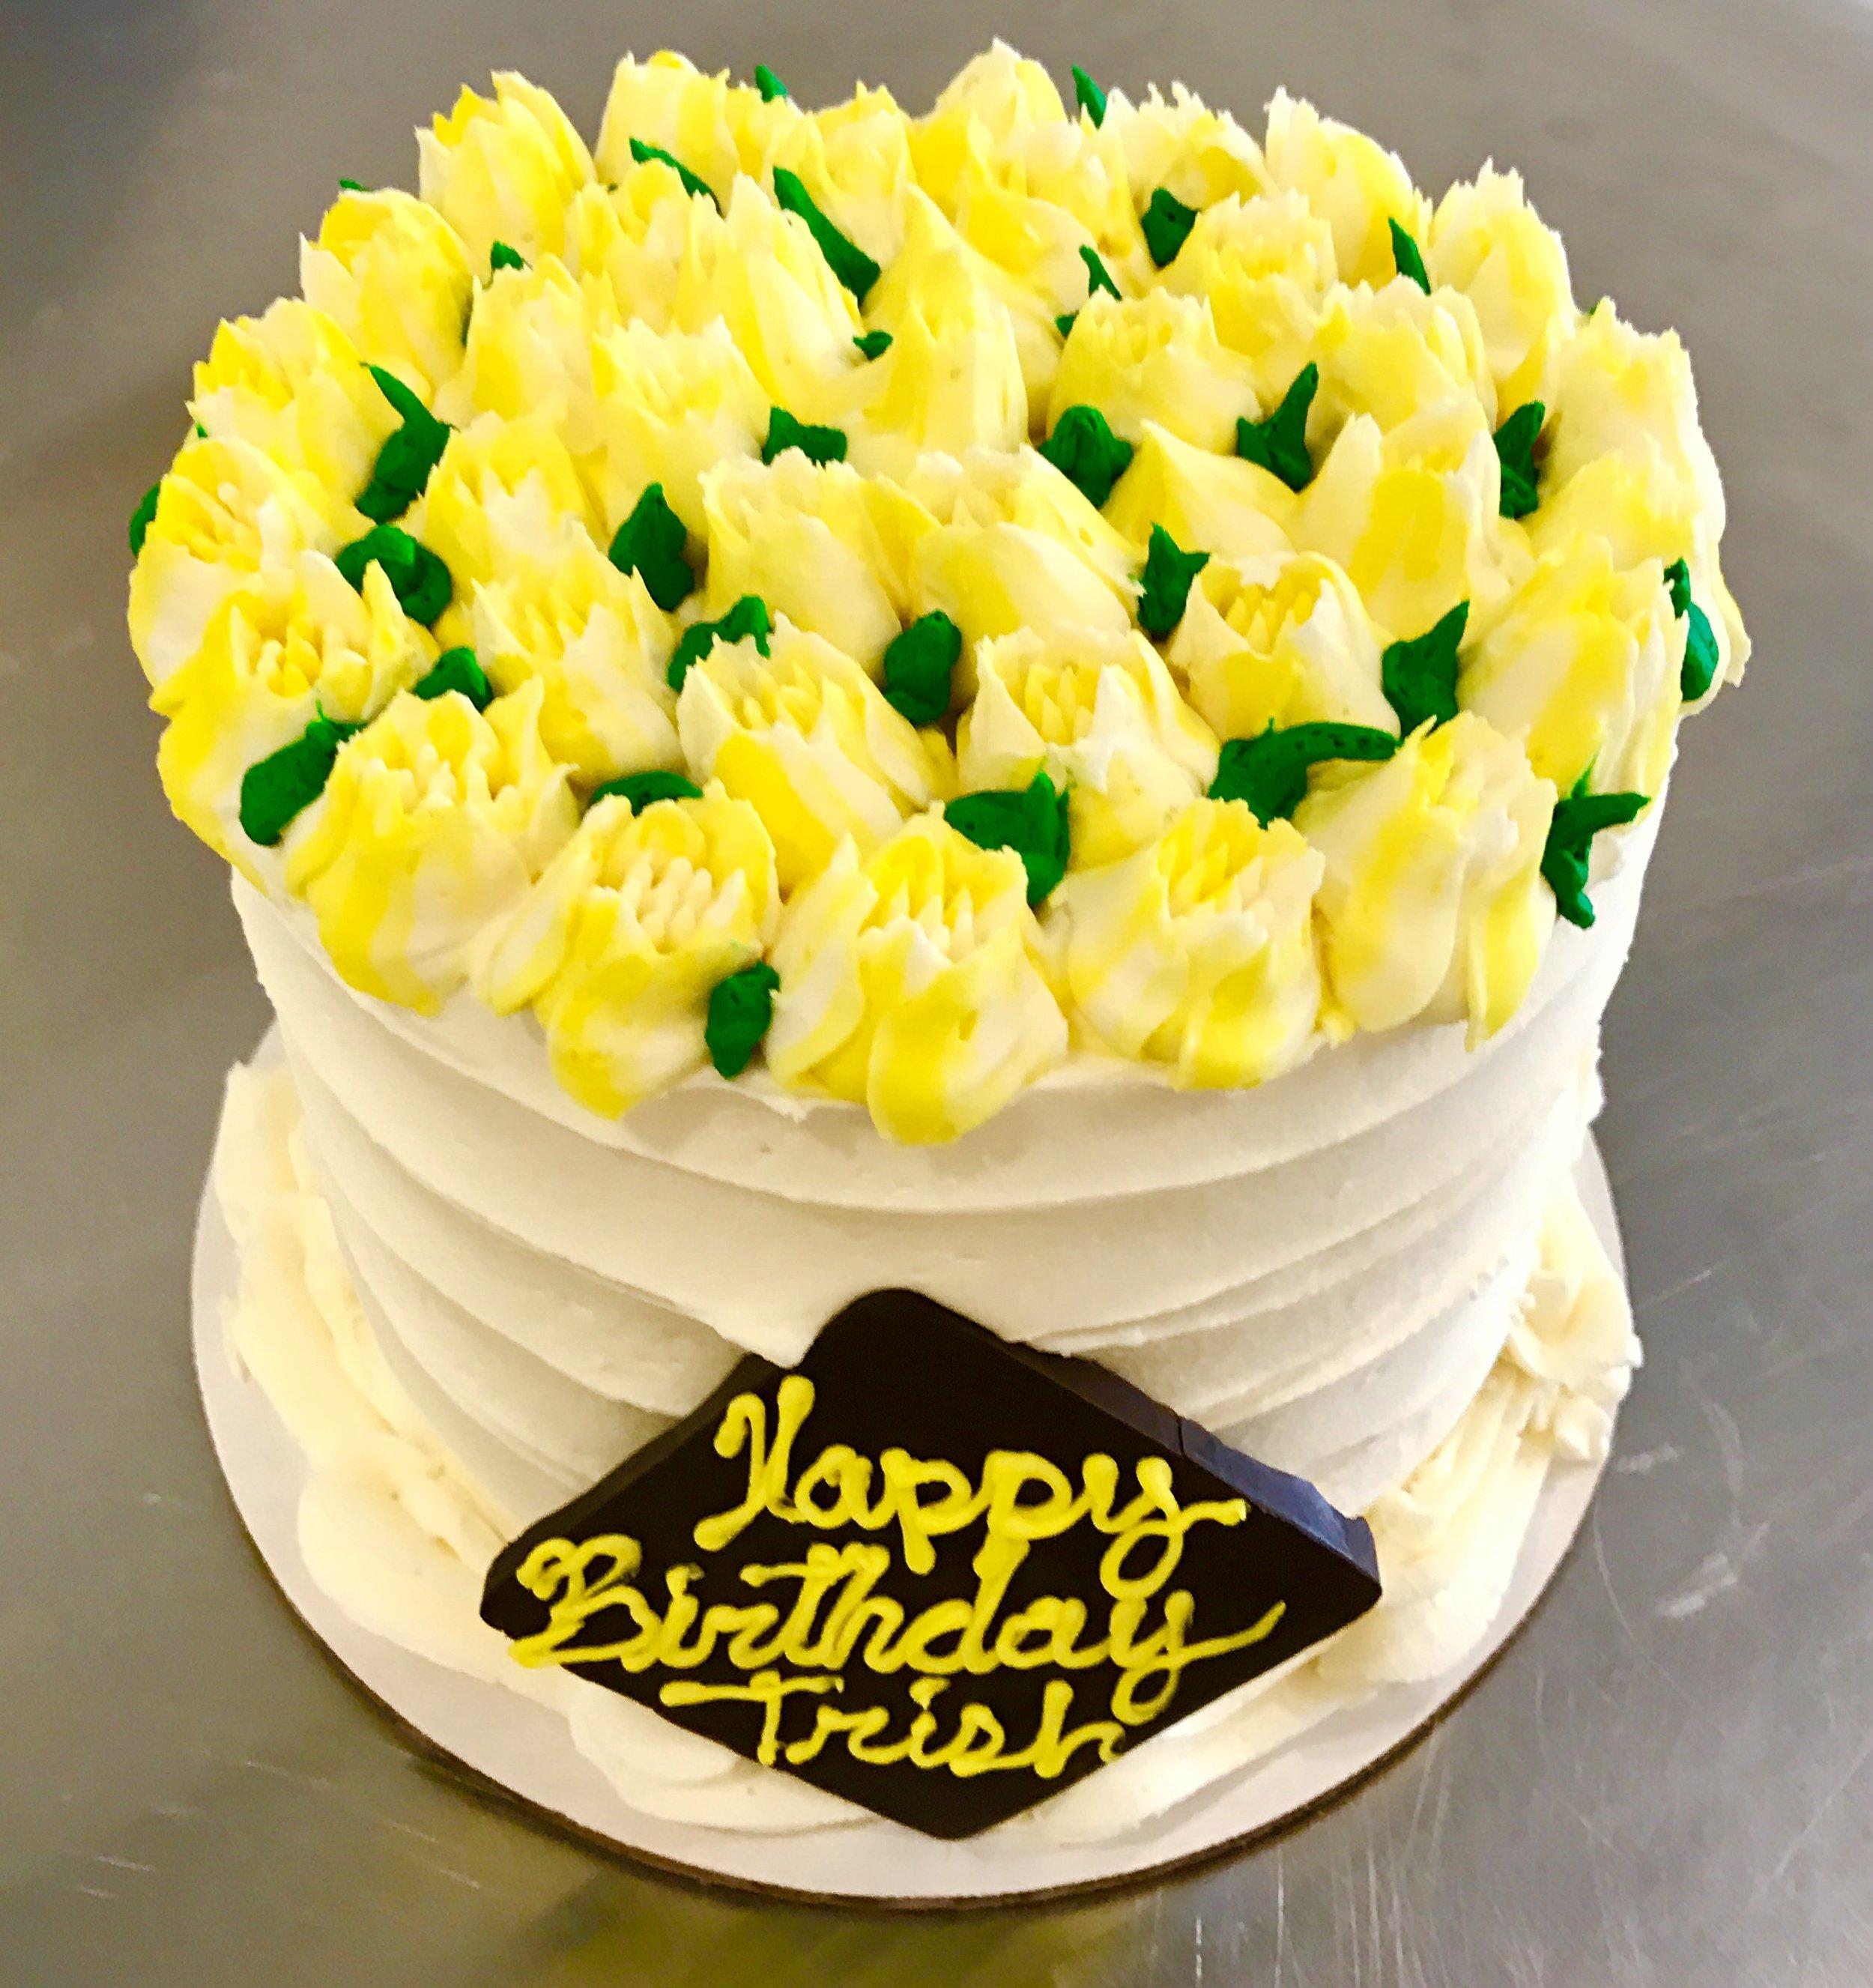 Birthspringyellowflowers.jpg